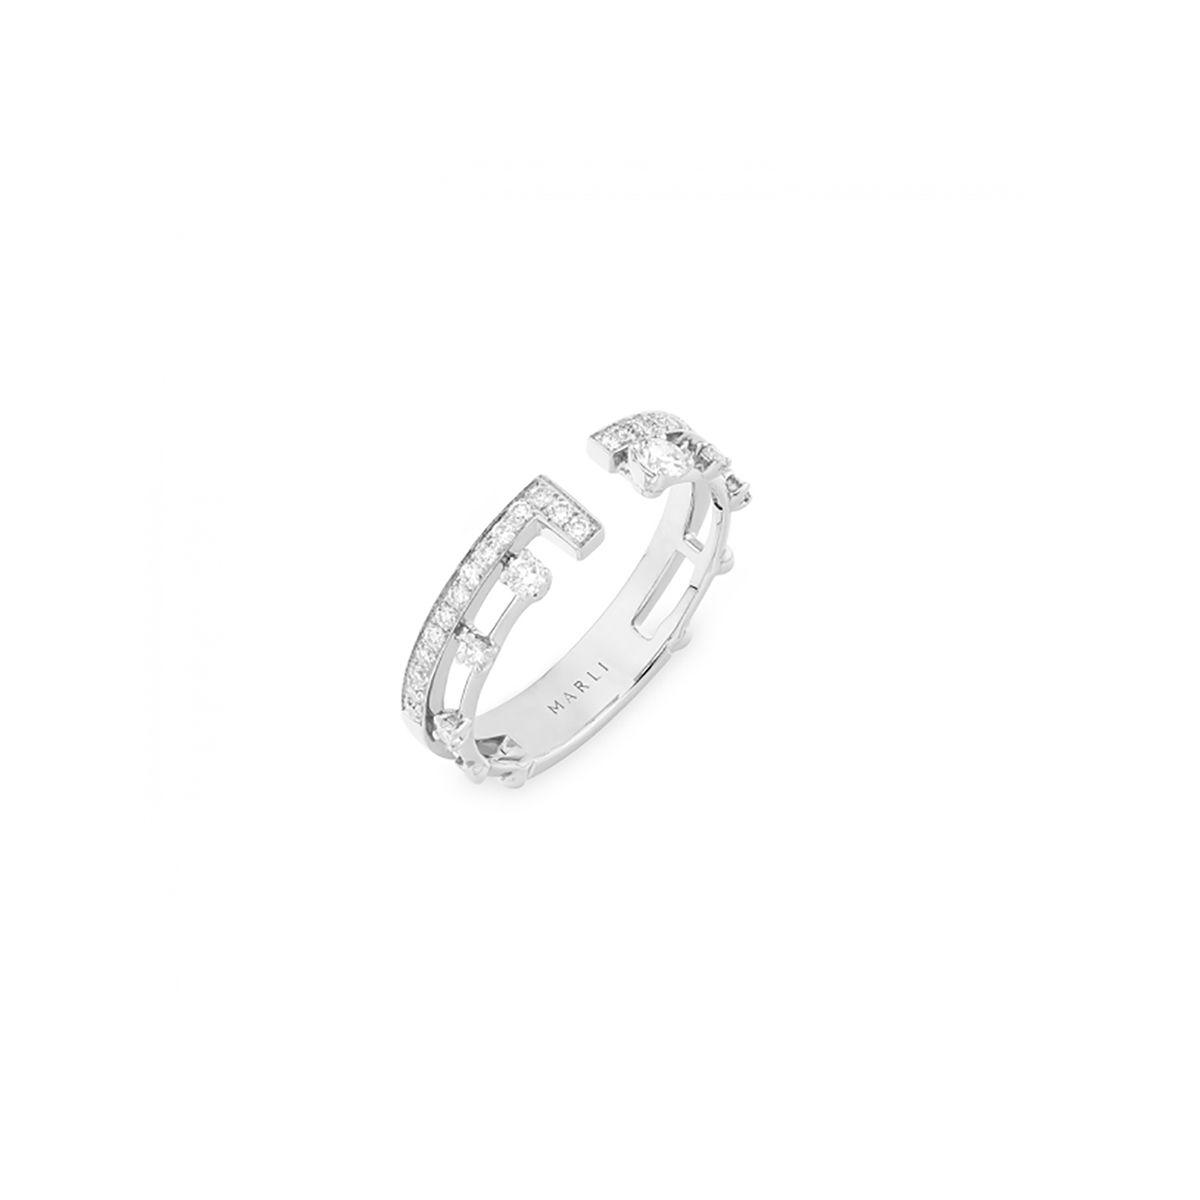 Marli New York White Gold and Diamond Asymmetrical Index Ring